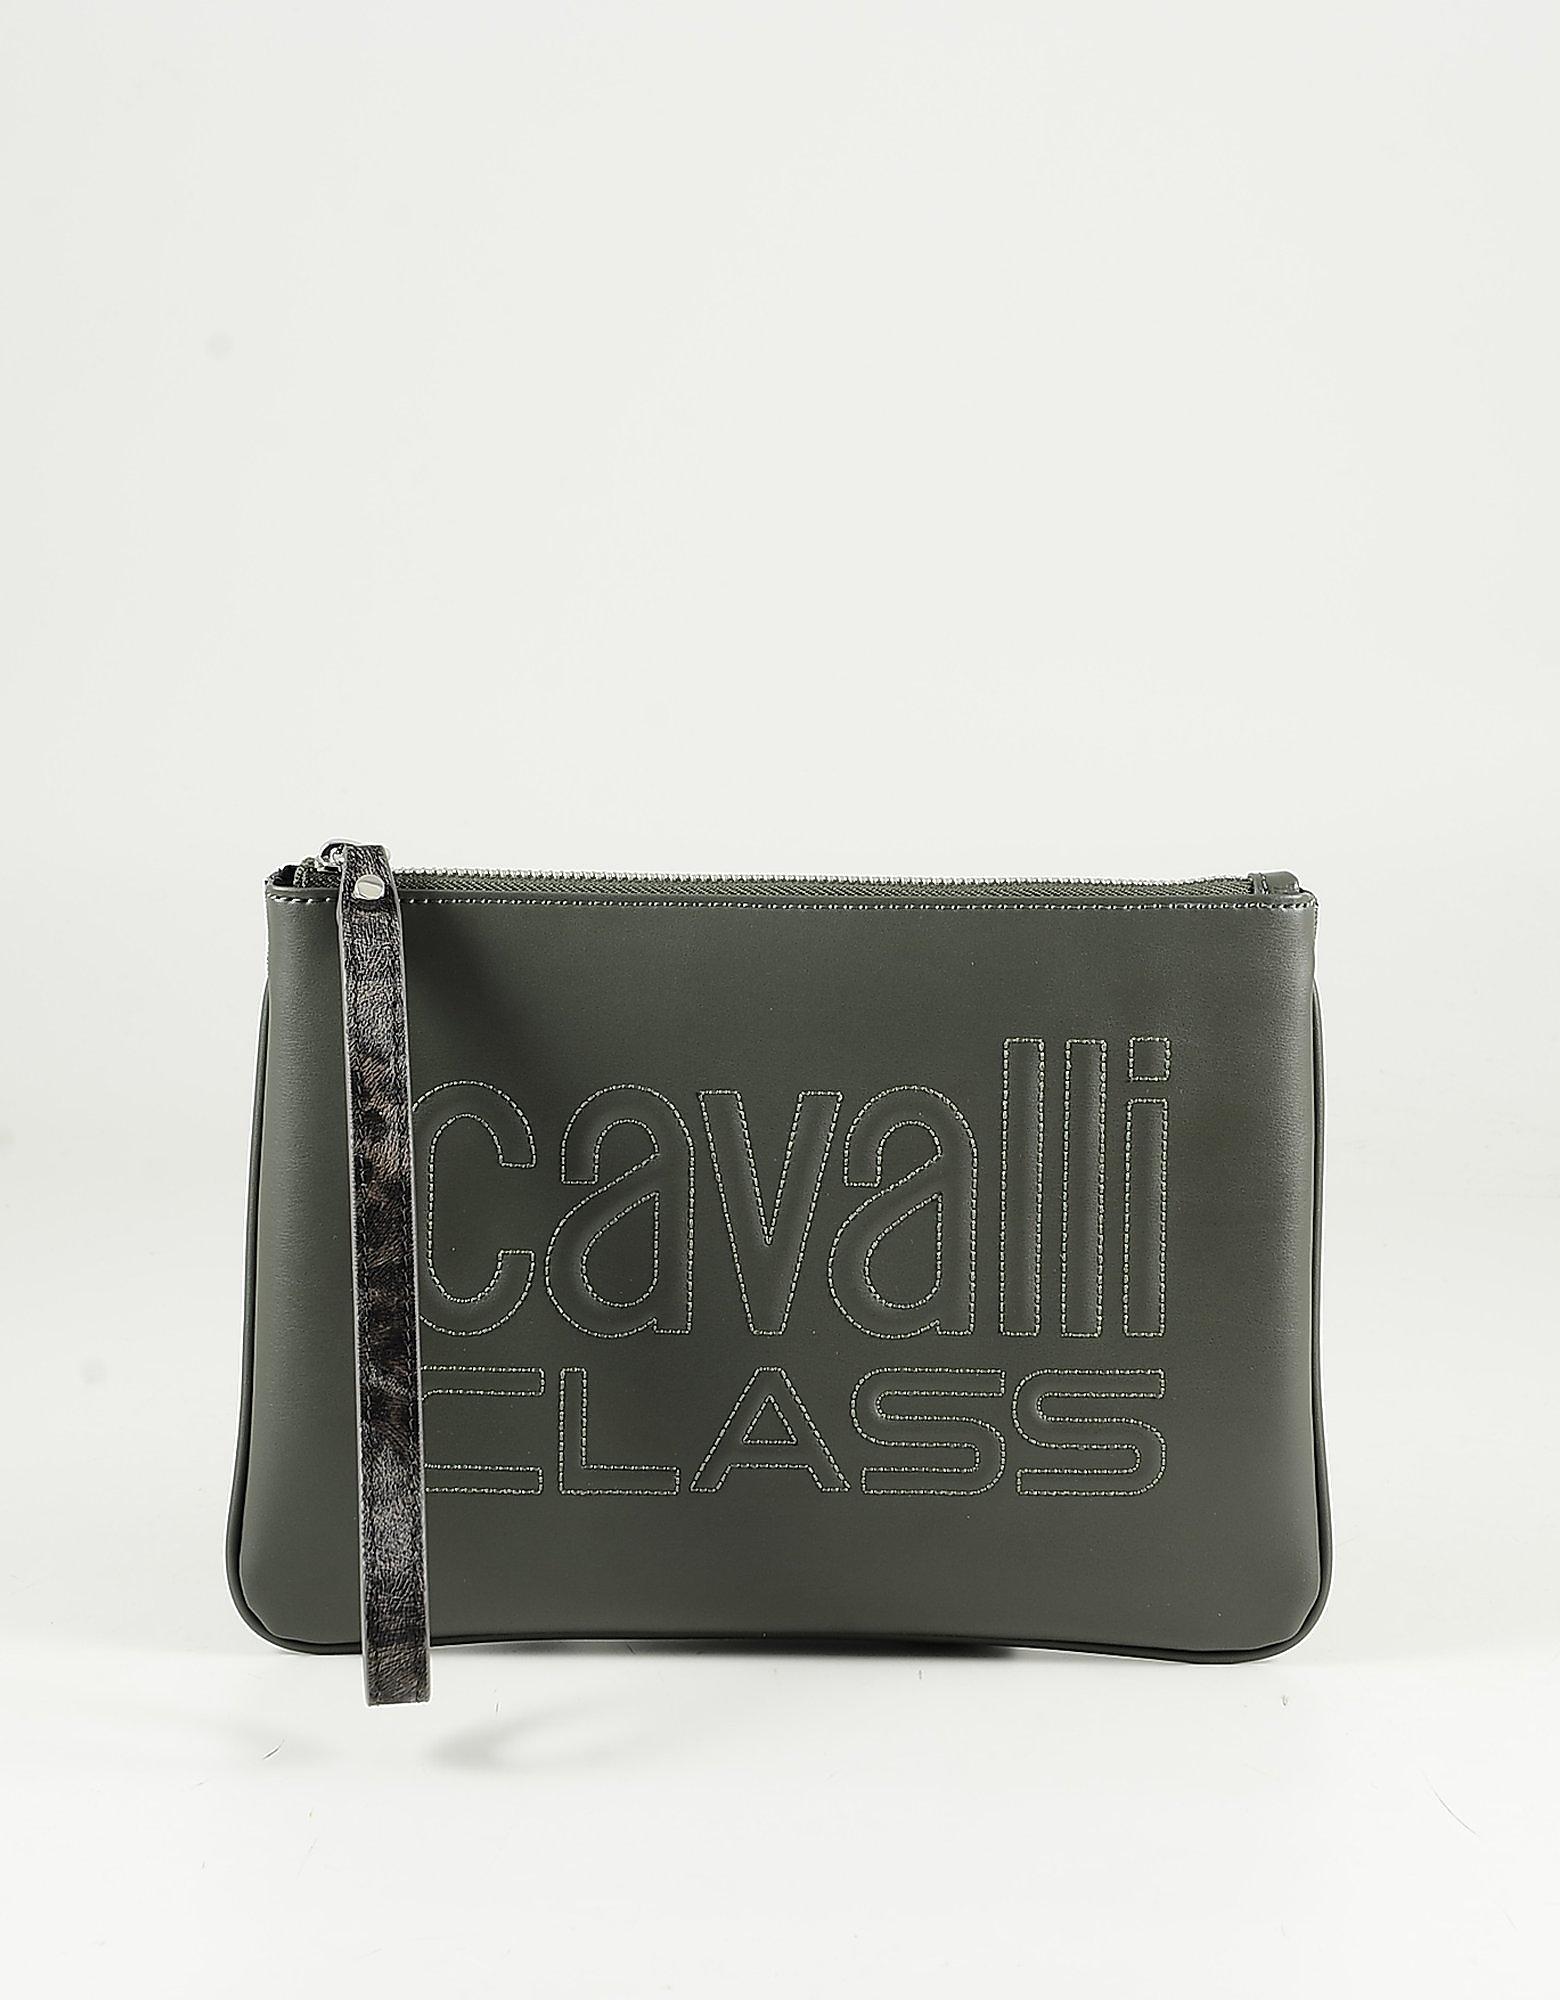 Class Roberto Cavalli Color Block Green Eco-leather Clutch W/shoulder Strap